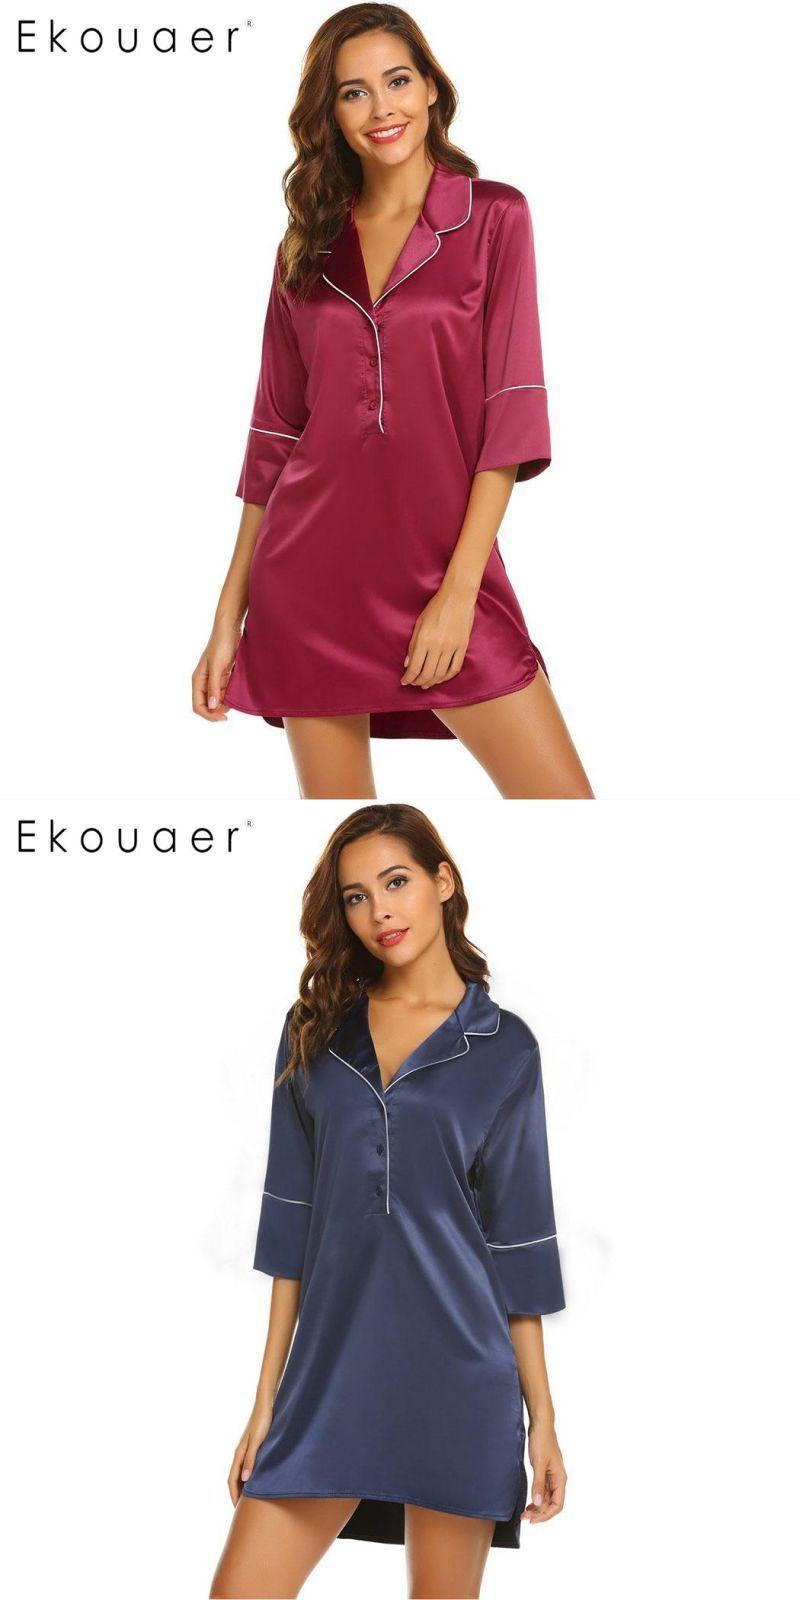 9c18eb6a579b Sleep casual solid long sleeve women shirt nightgowns nightwear  polyester